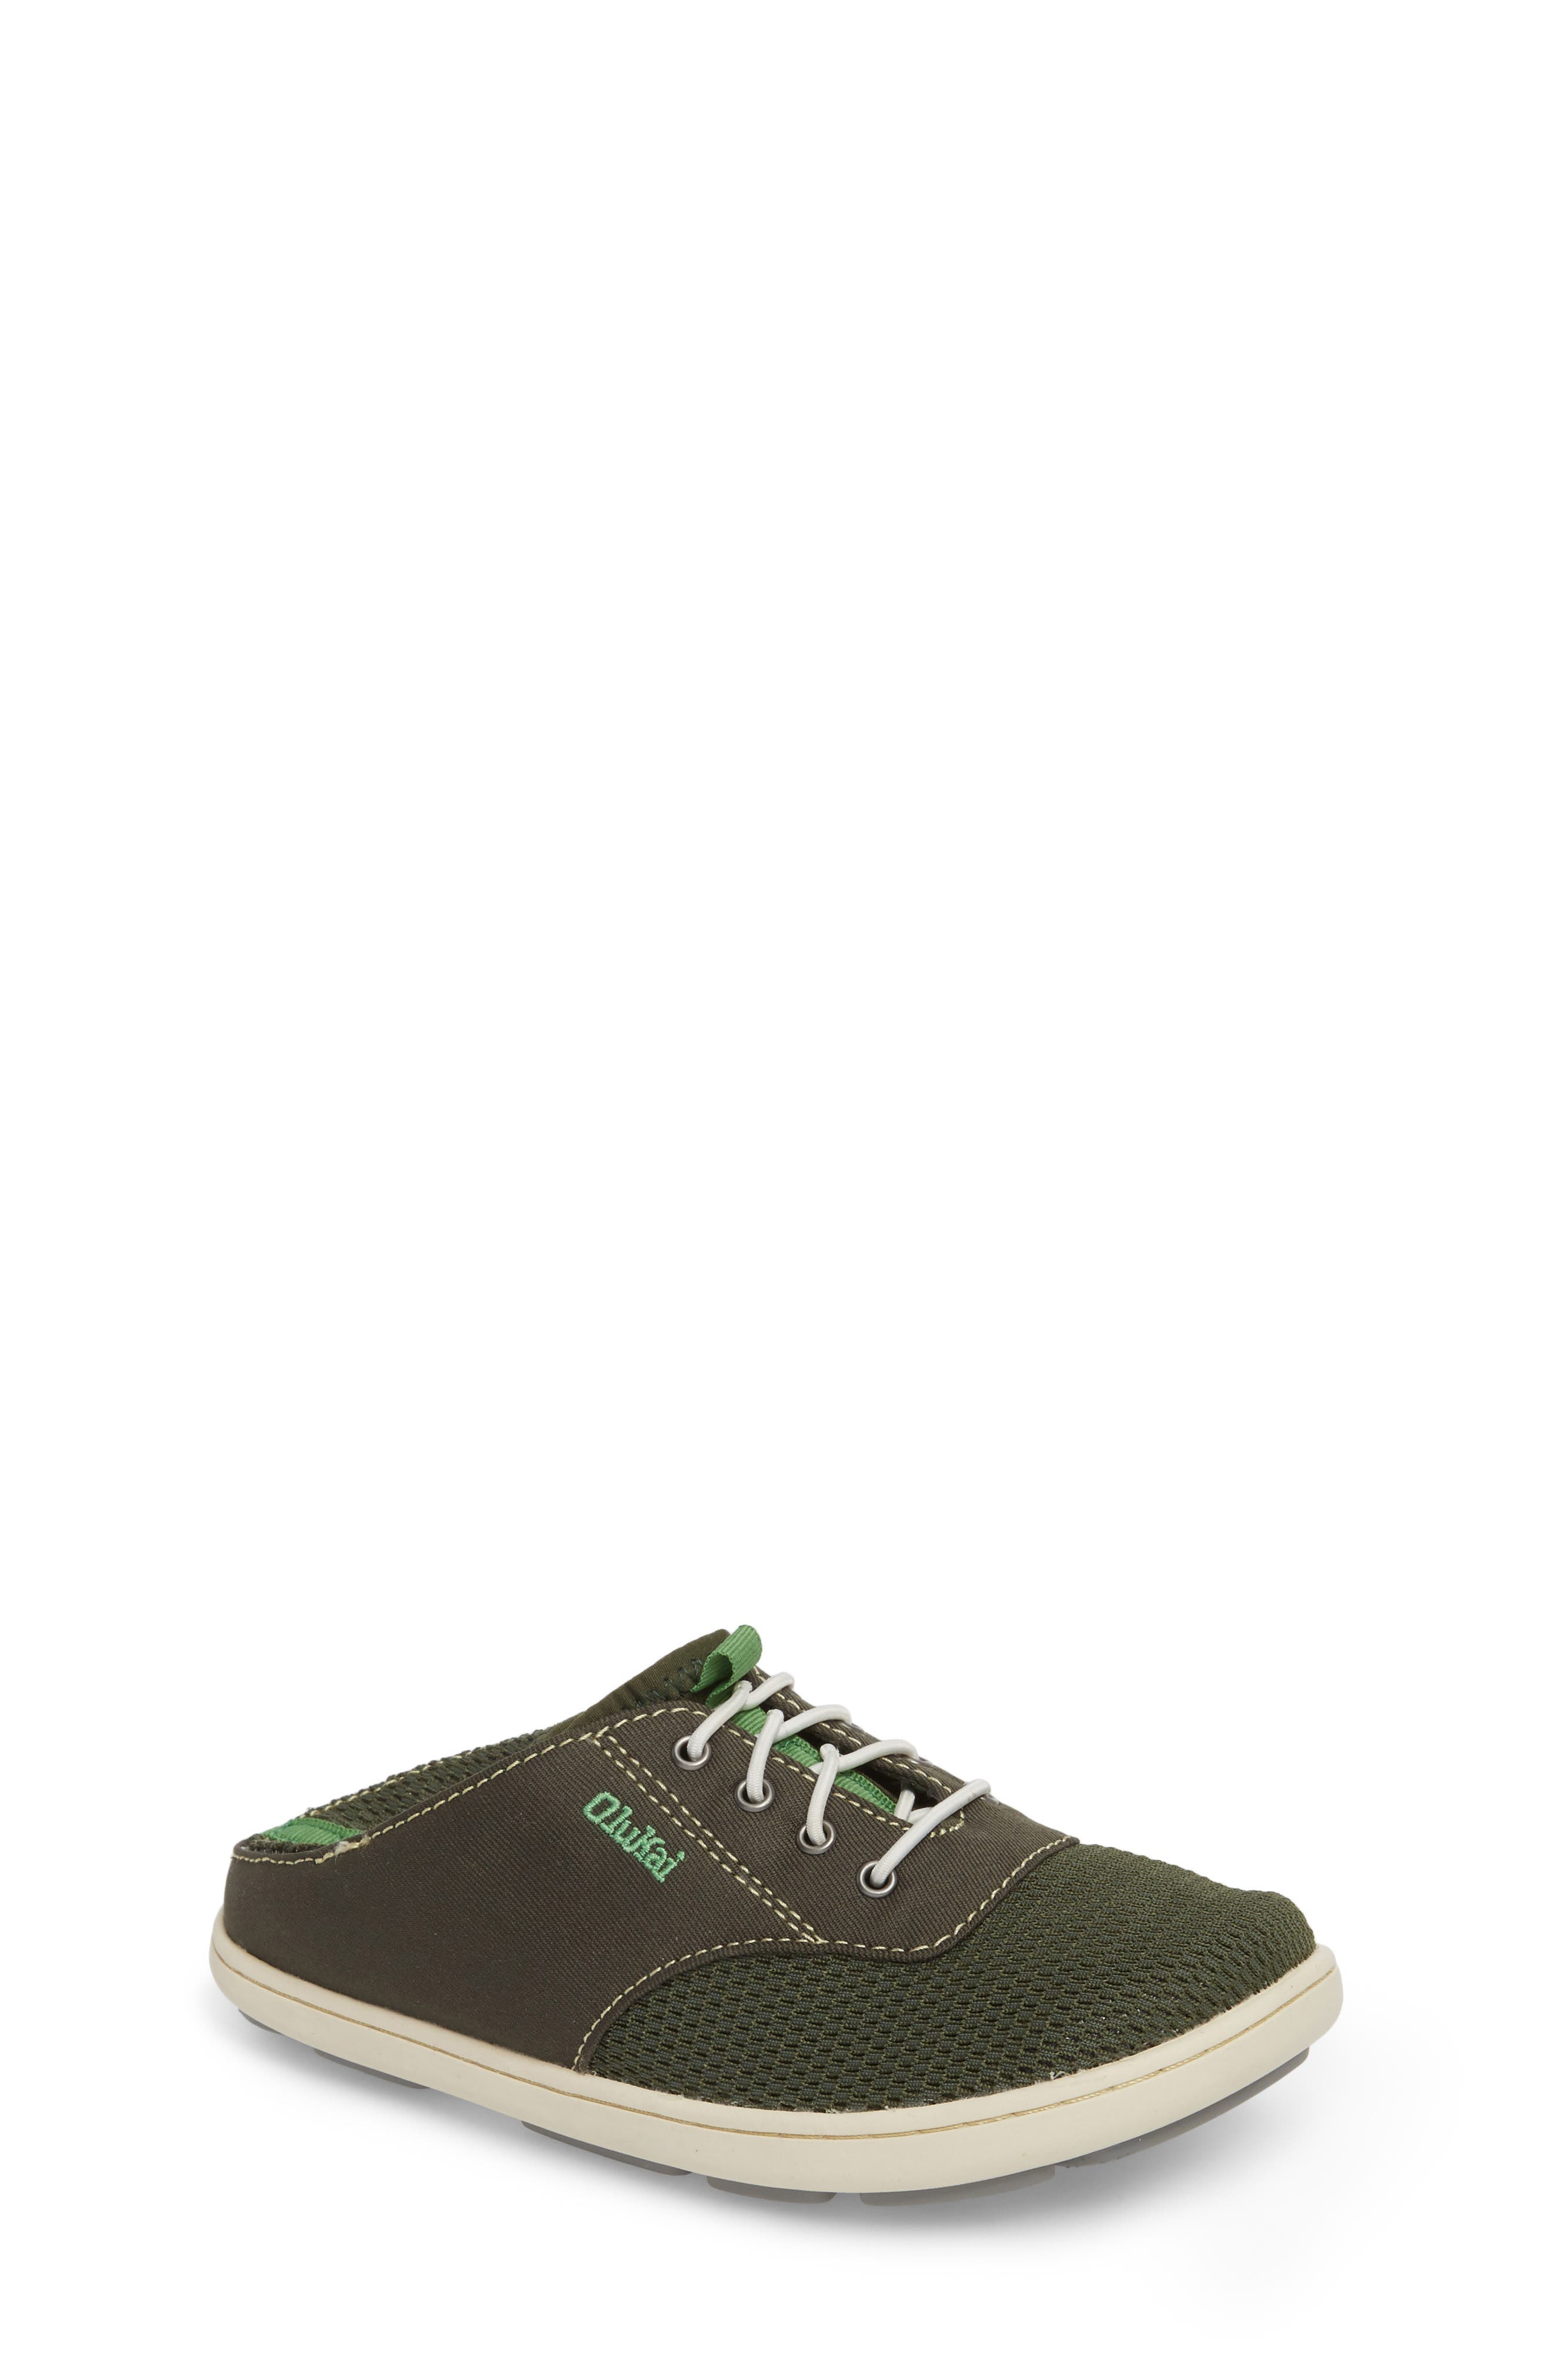 OLUKAI Nohea Moku Water Resistant Shoe, Main, color, SEA GRASS/ SEA GRASS